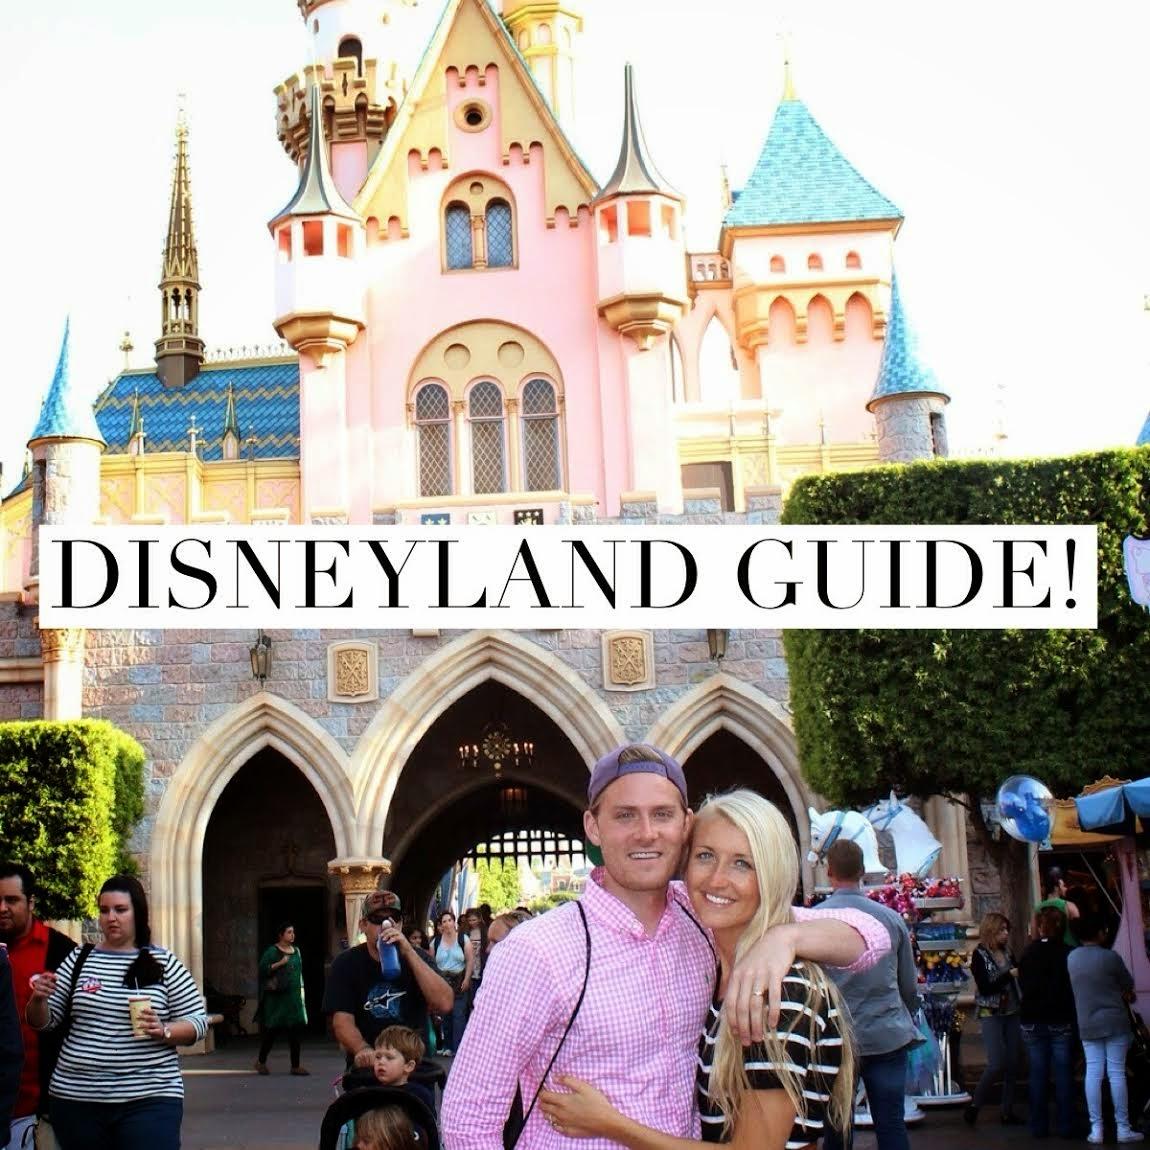 guide to DISNEYLAND!!!